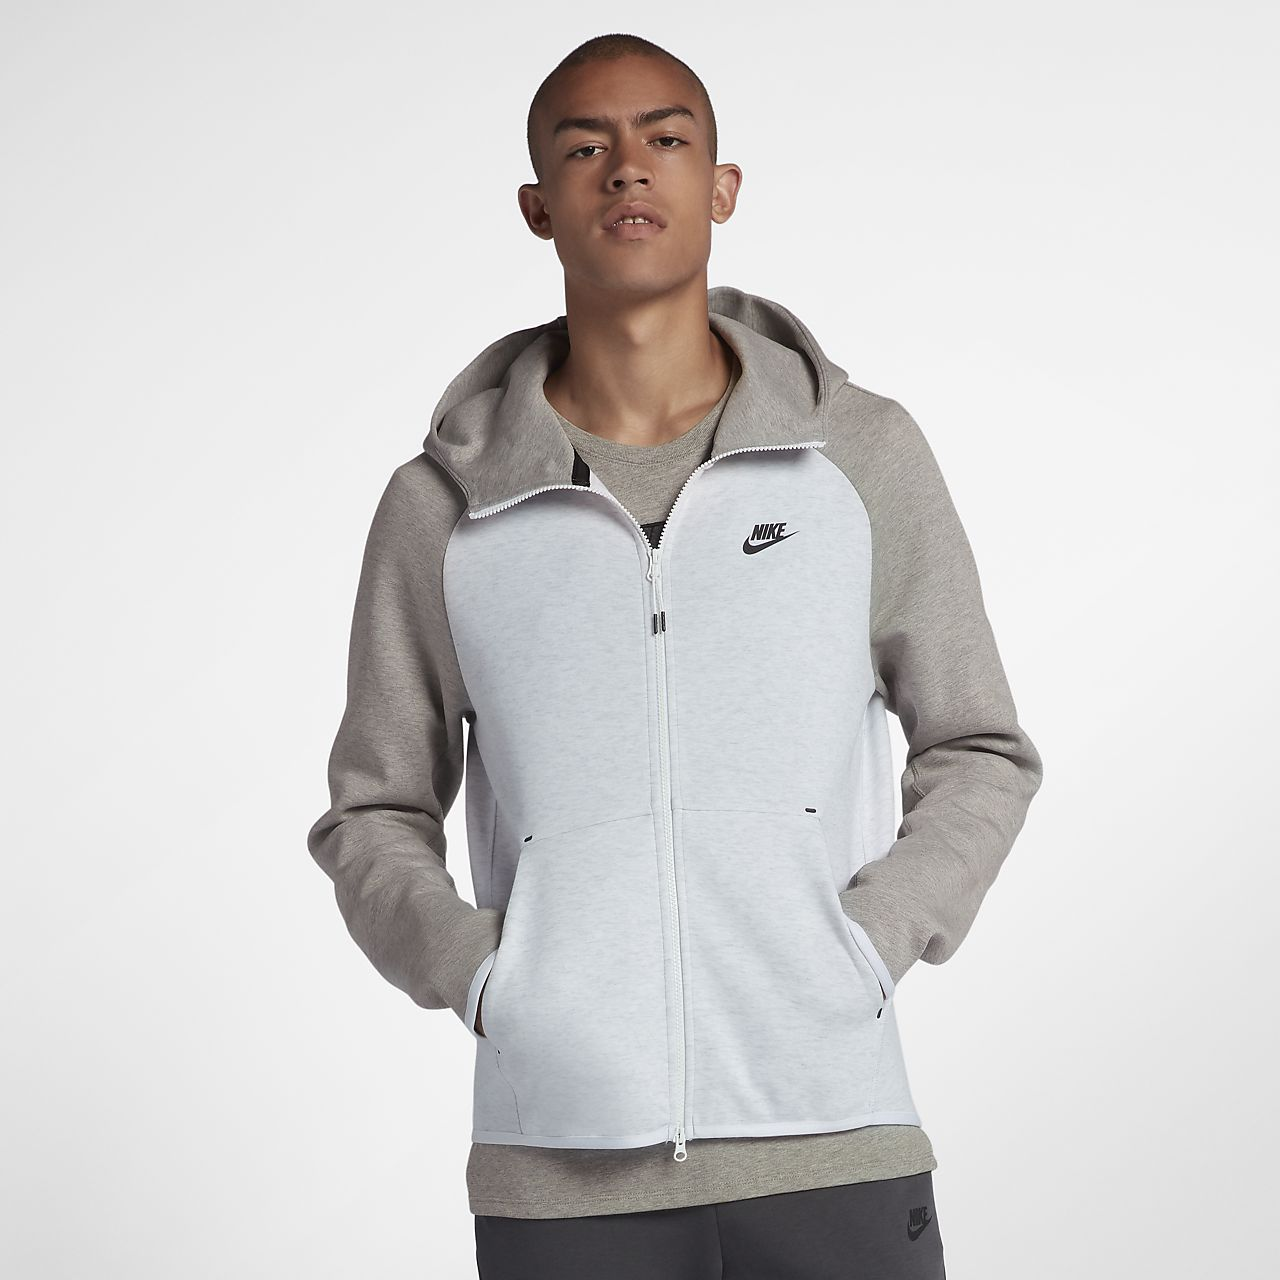 a9b8a94a085b Nike Sportswear Tech Fleece Men s Full-Zip Hoodie. Nike.com GB